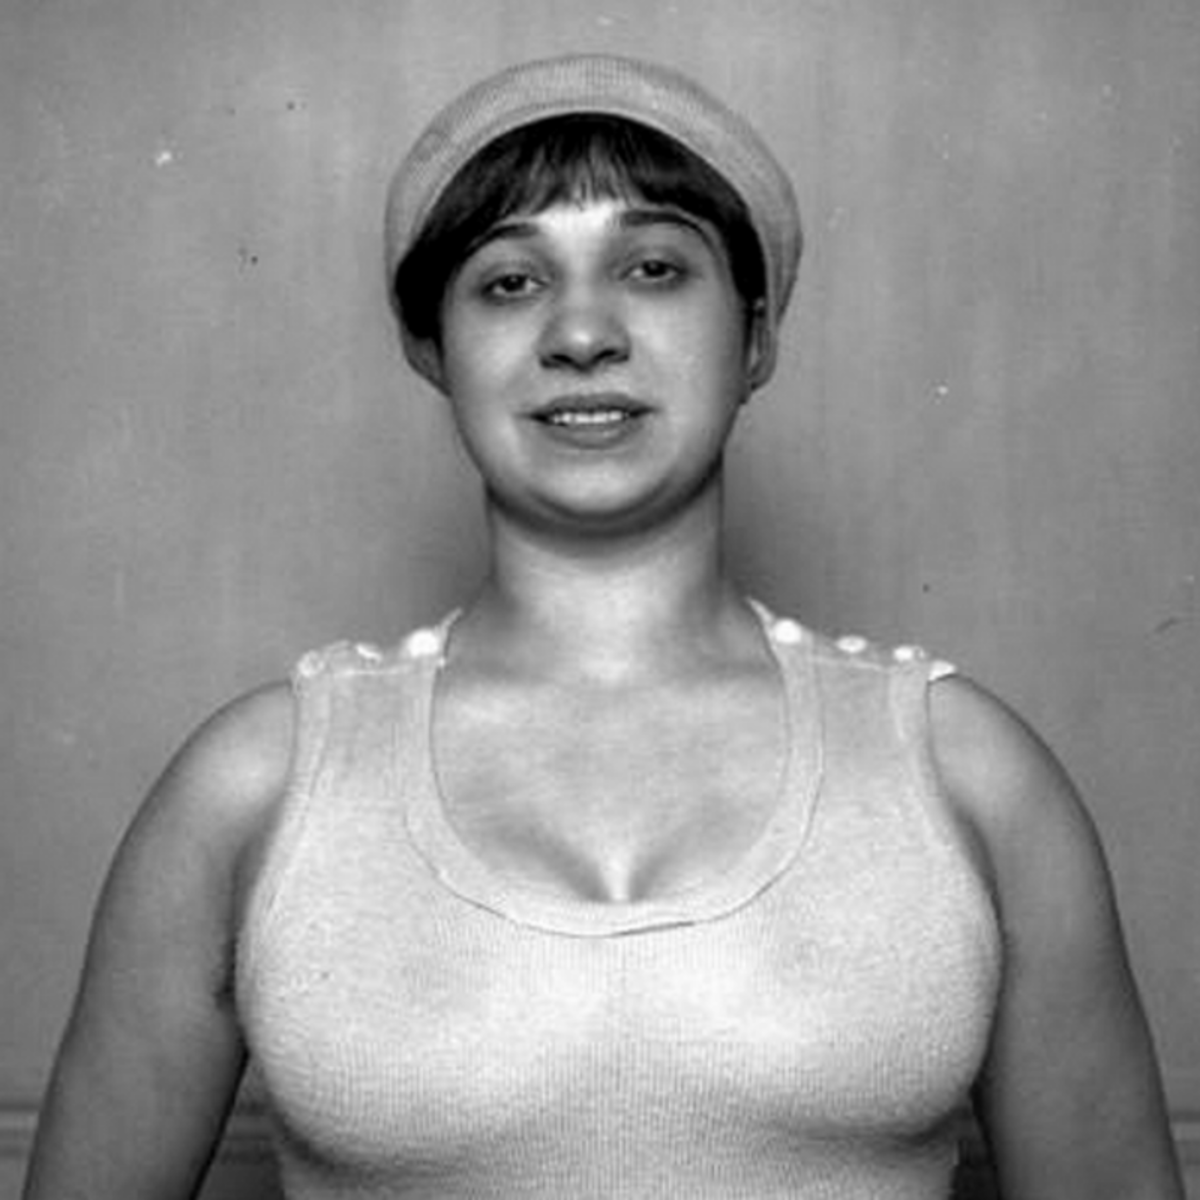 Violette Morris: An Astonishing Tale